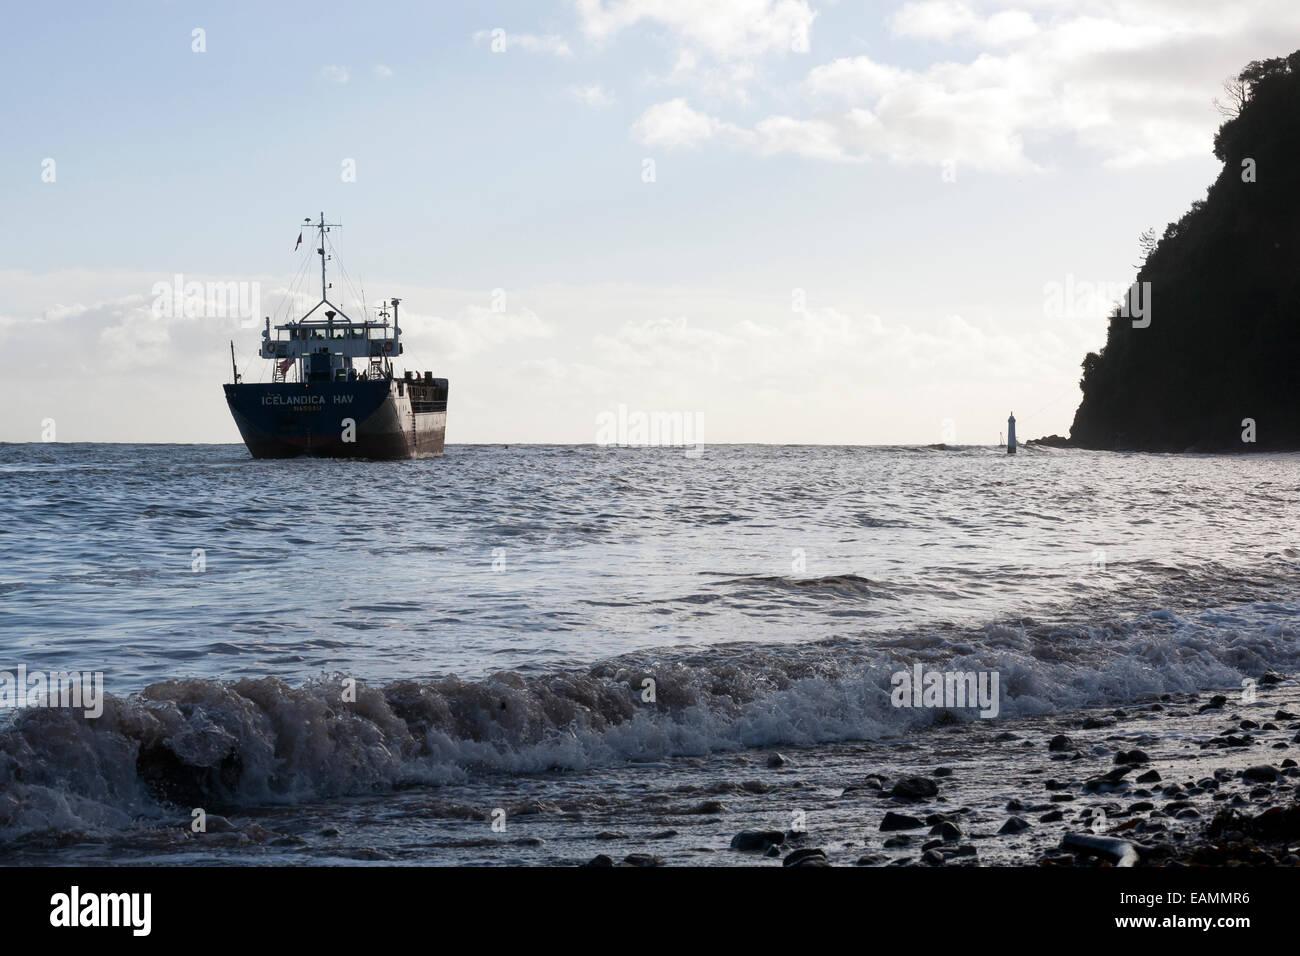 container ship icelandica hav leaving Teignmouth,Devon,Shaldon,General Cargo, shipping, ship, cargo, front, aerial, - Stock Image